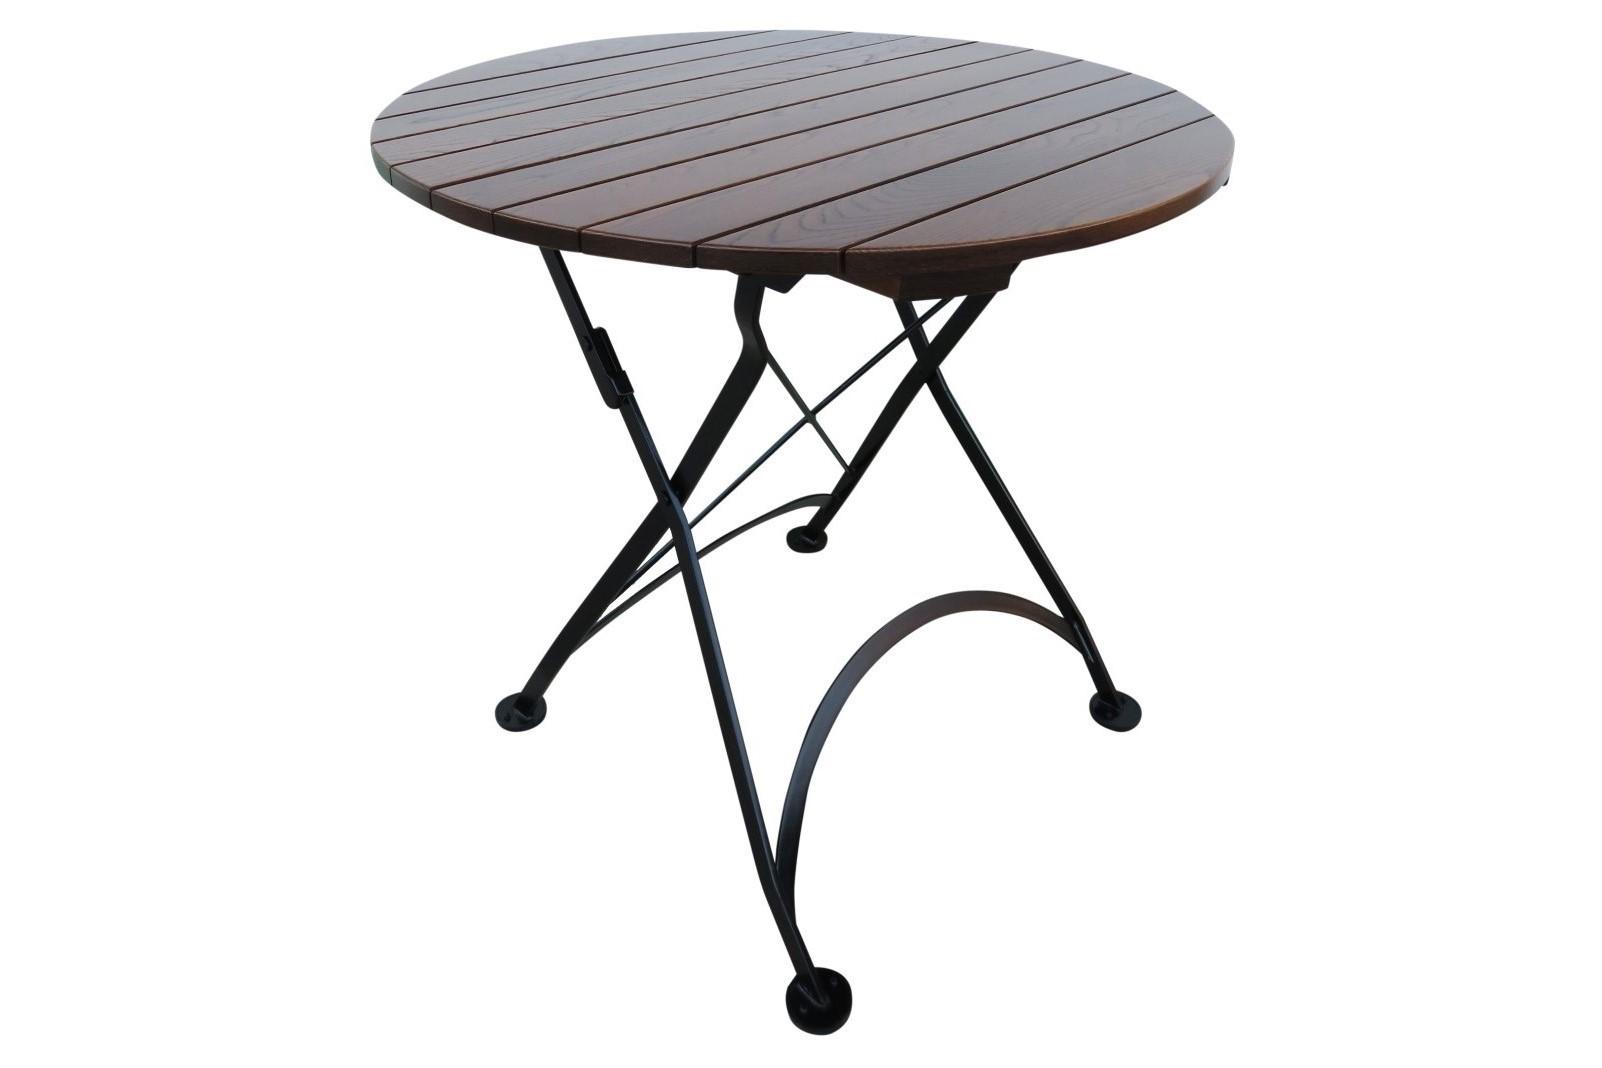 4106CW-BK European Chestnut dining table